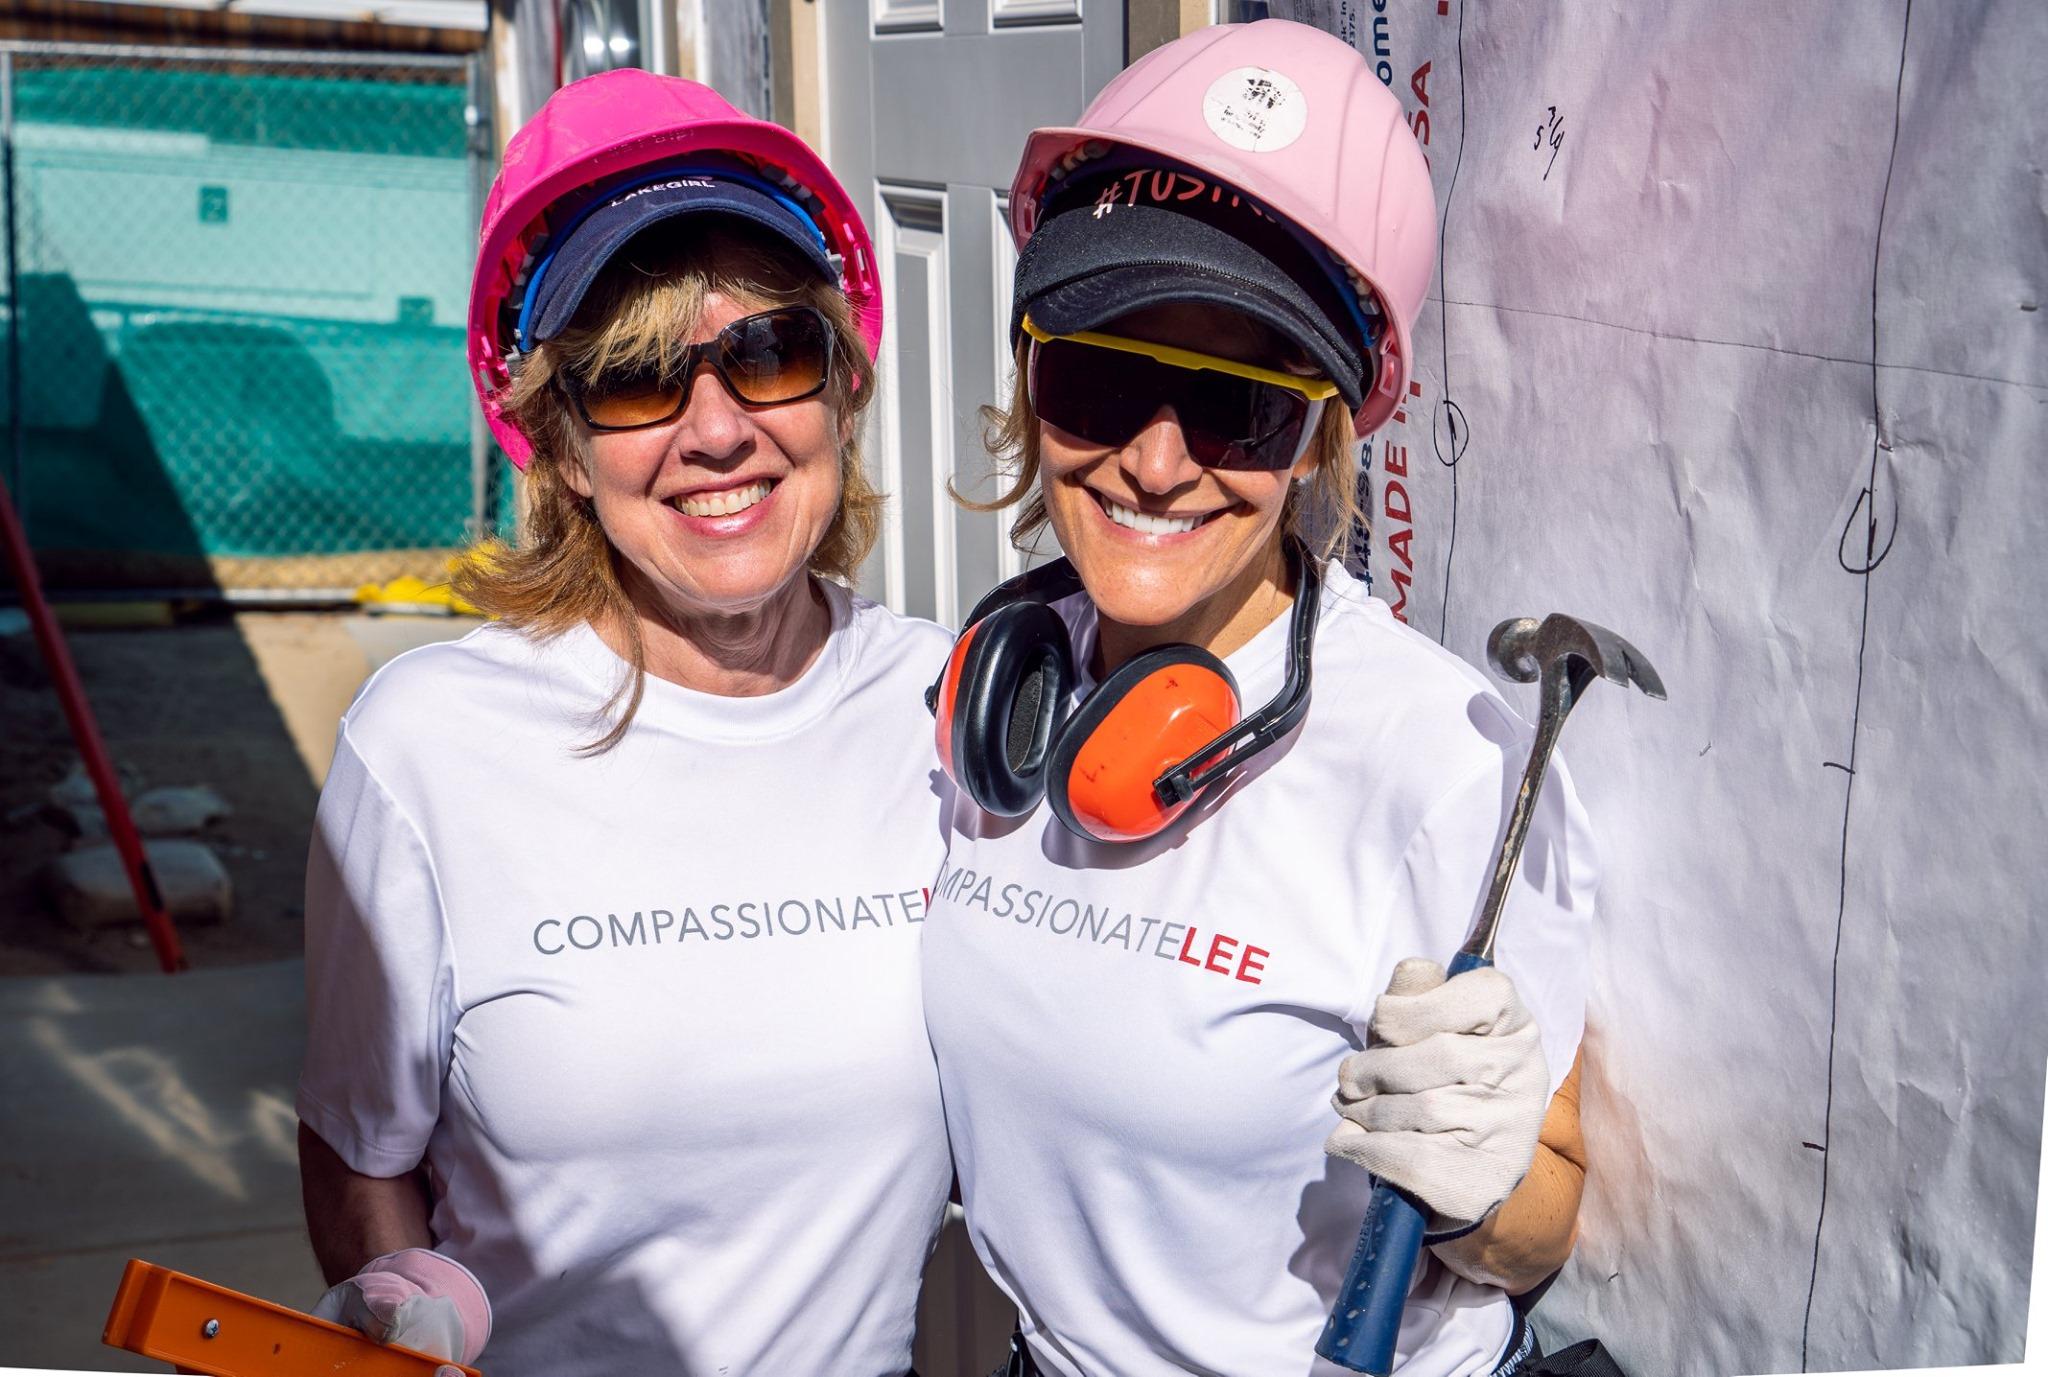 CompassionateLEE + Habitat for Humanity